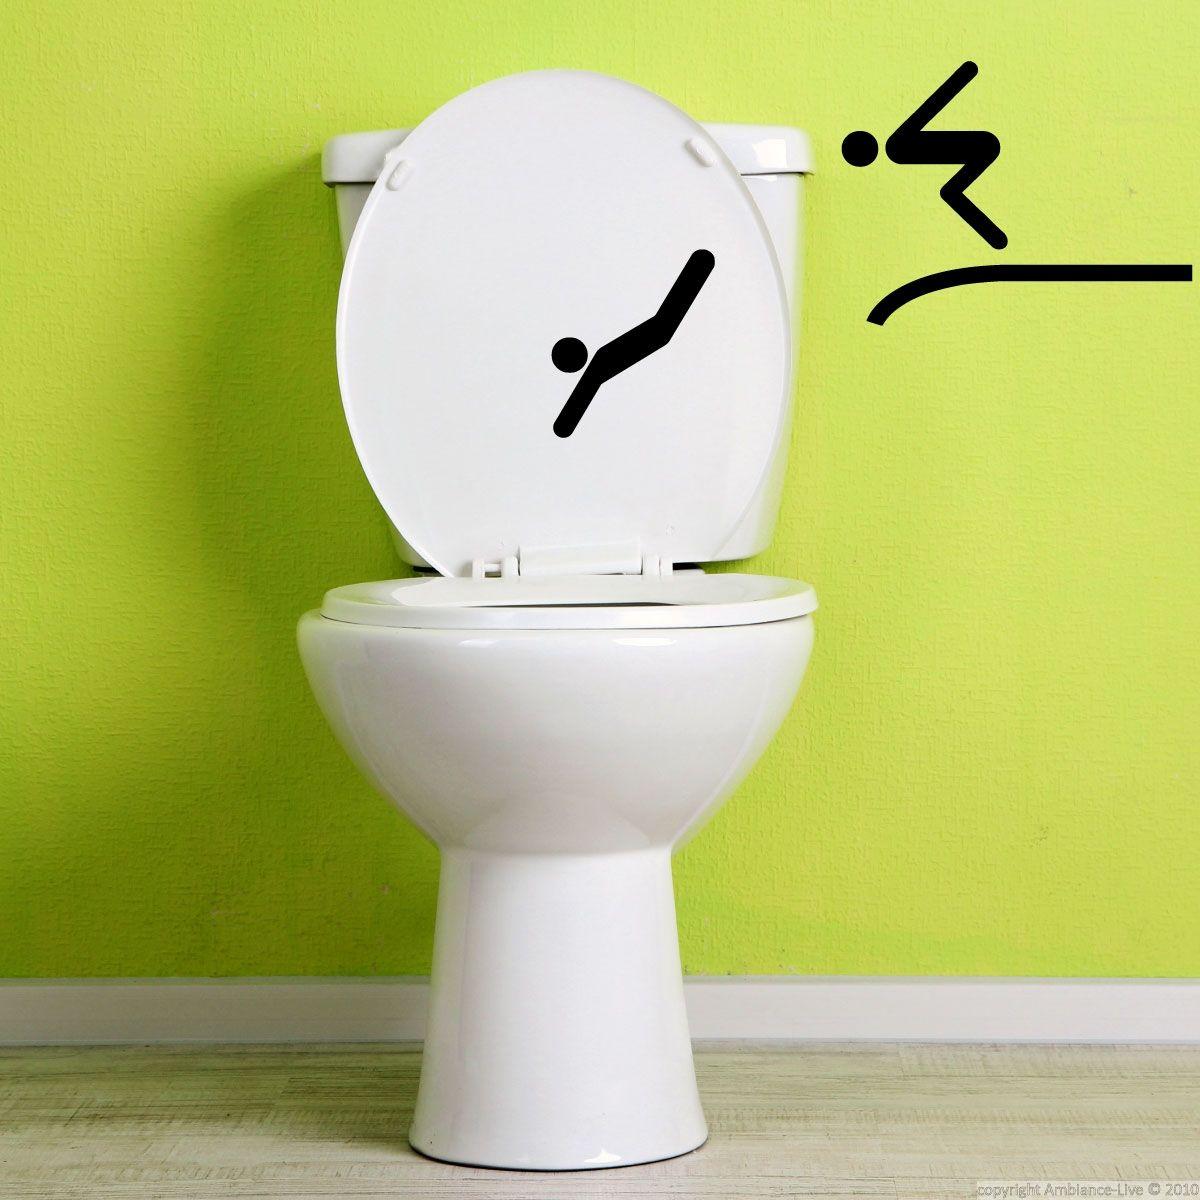 Salle De Bain Stickers ~ sticker deux plongeurs toilet walls and creative